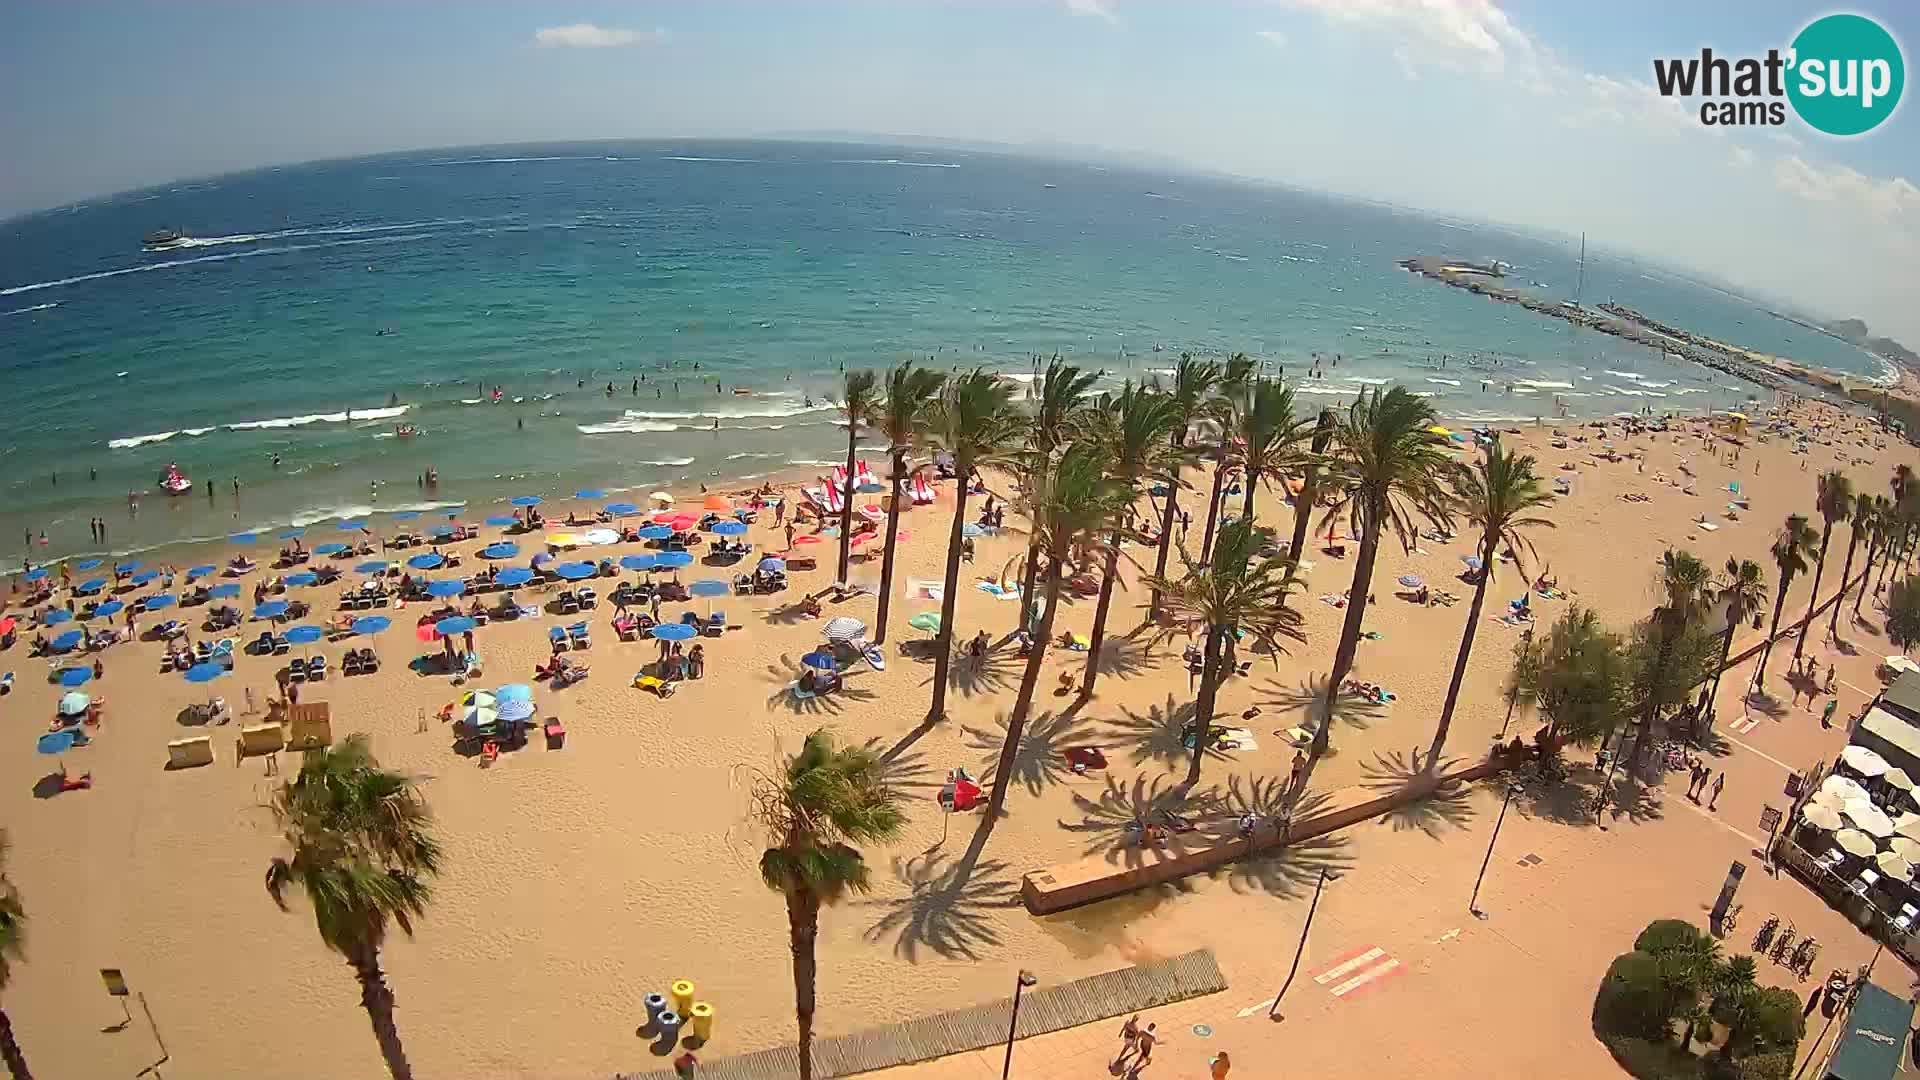 LIVEcam Roses plage – Hotel Montecarlo